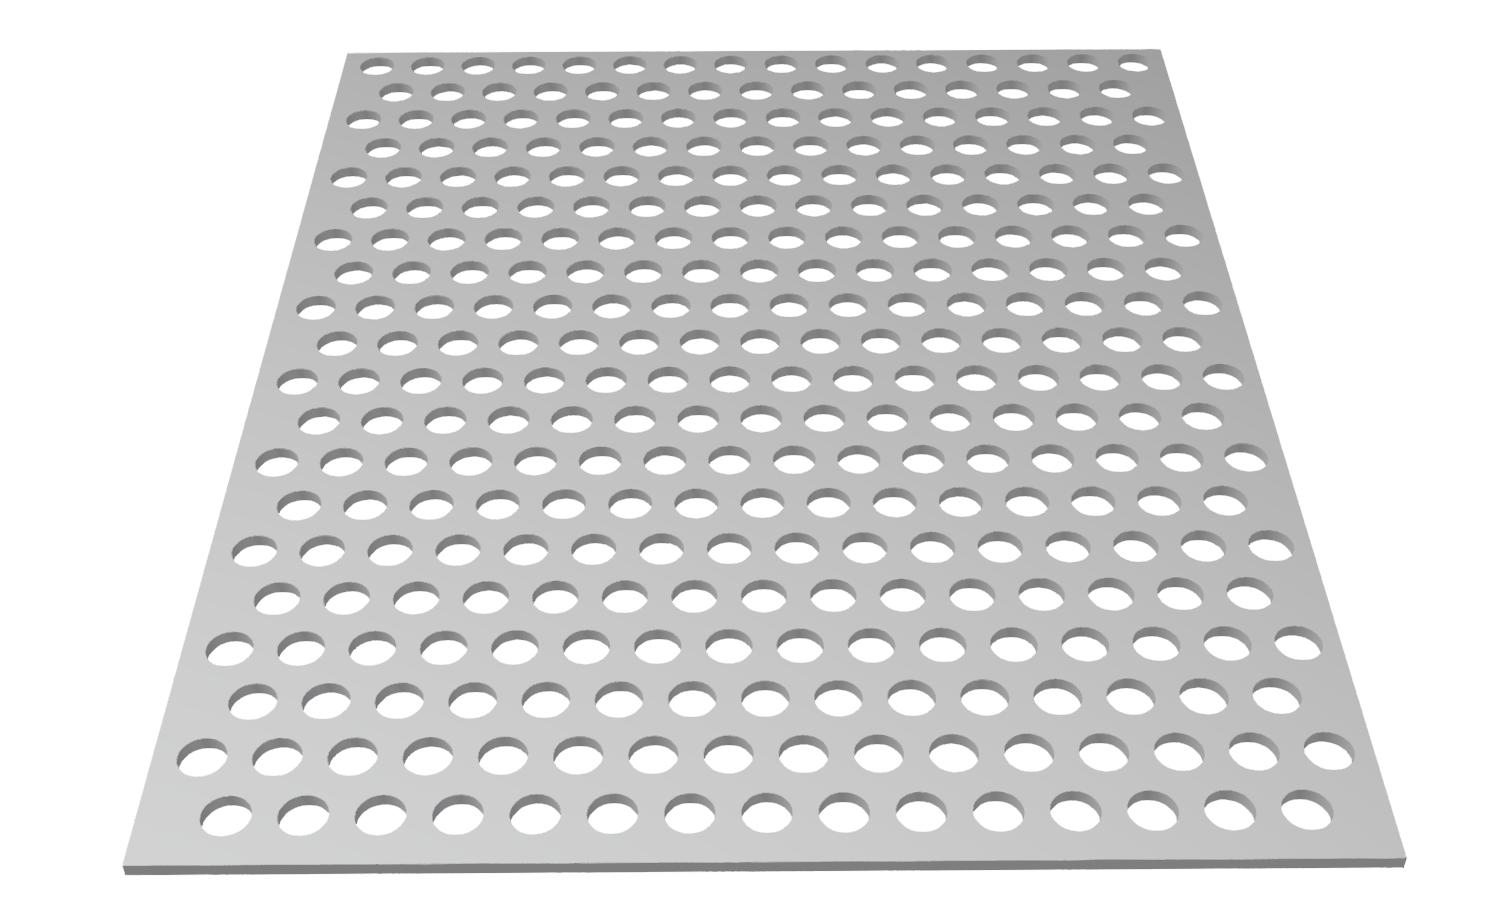 Lochblech AL 3 mm Rv 10-15, blank